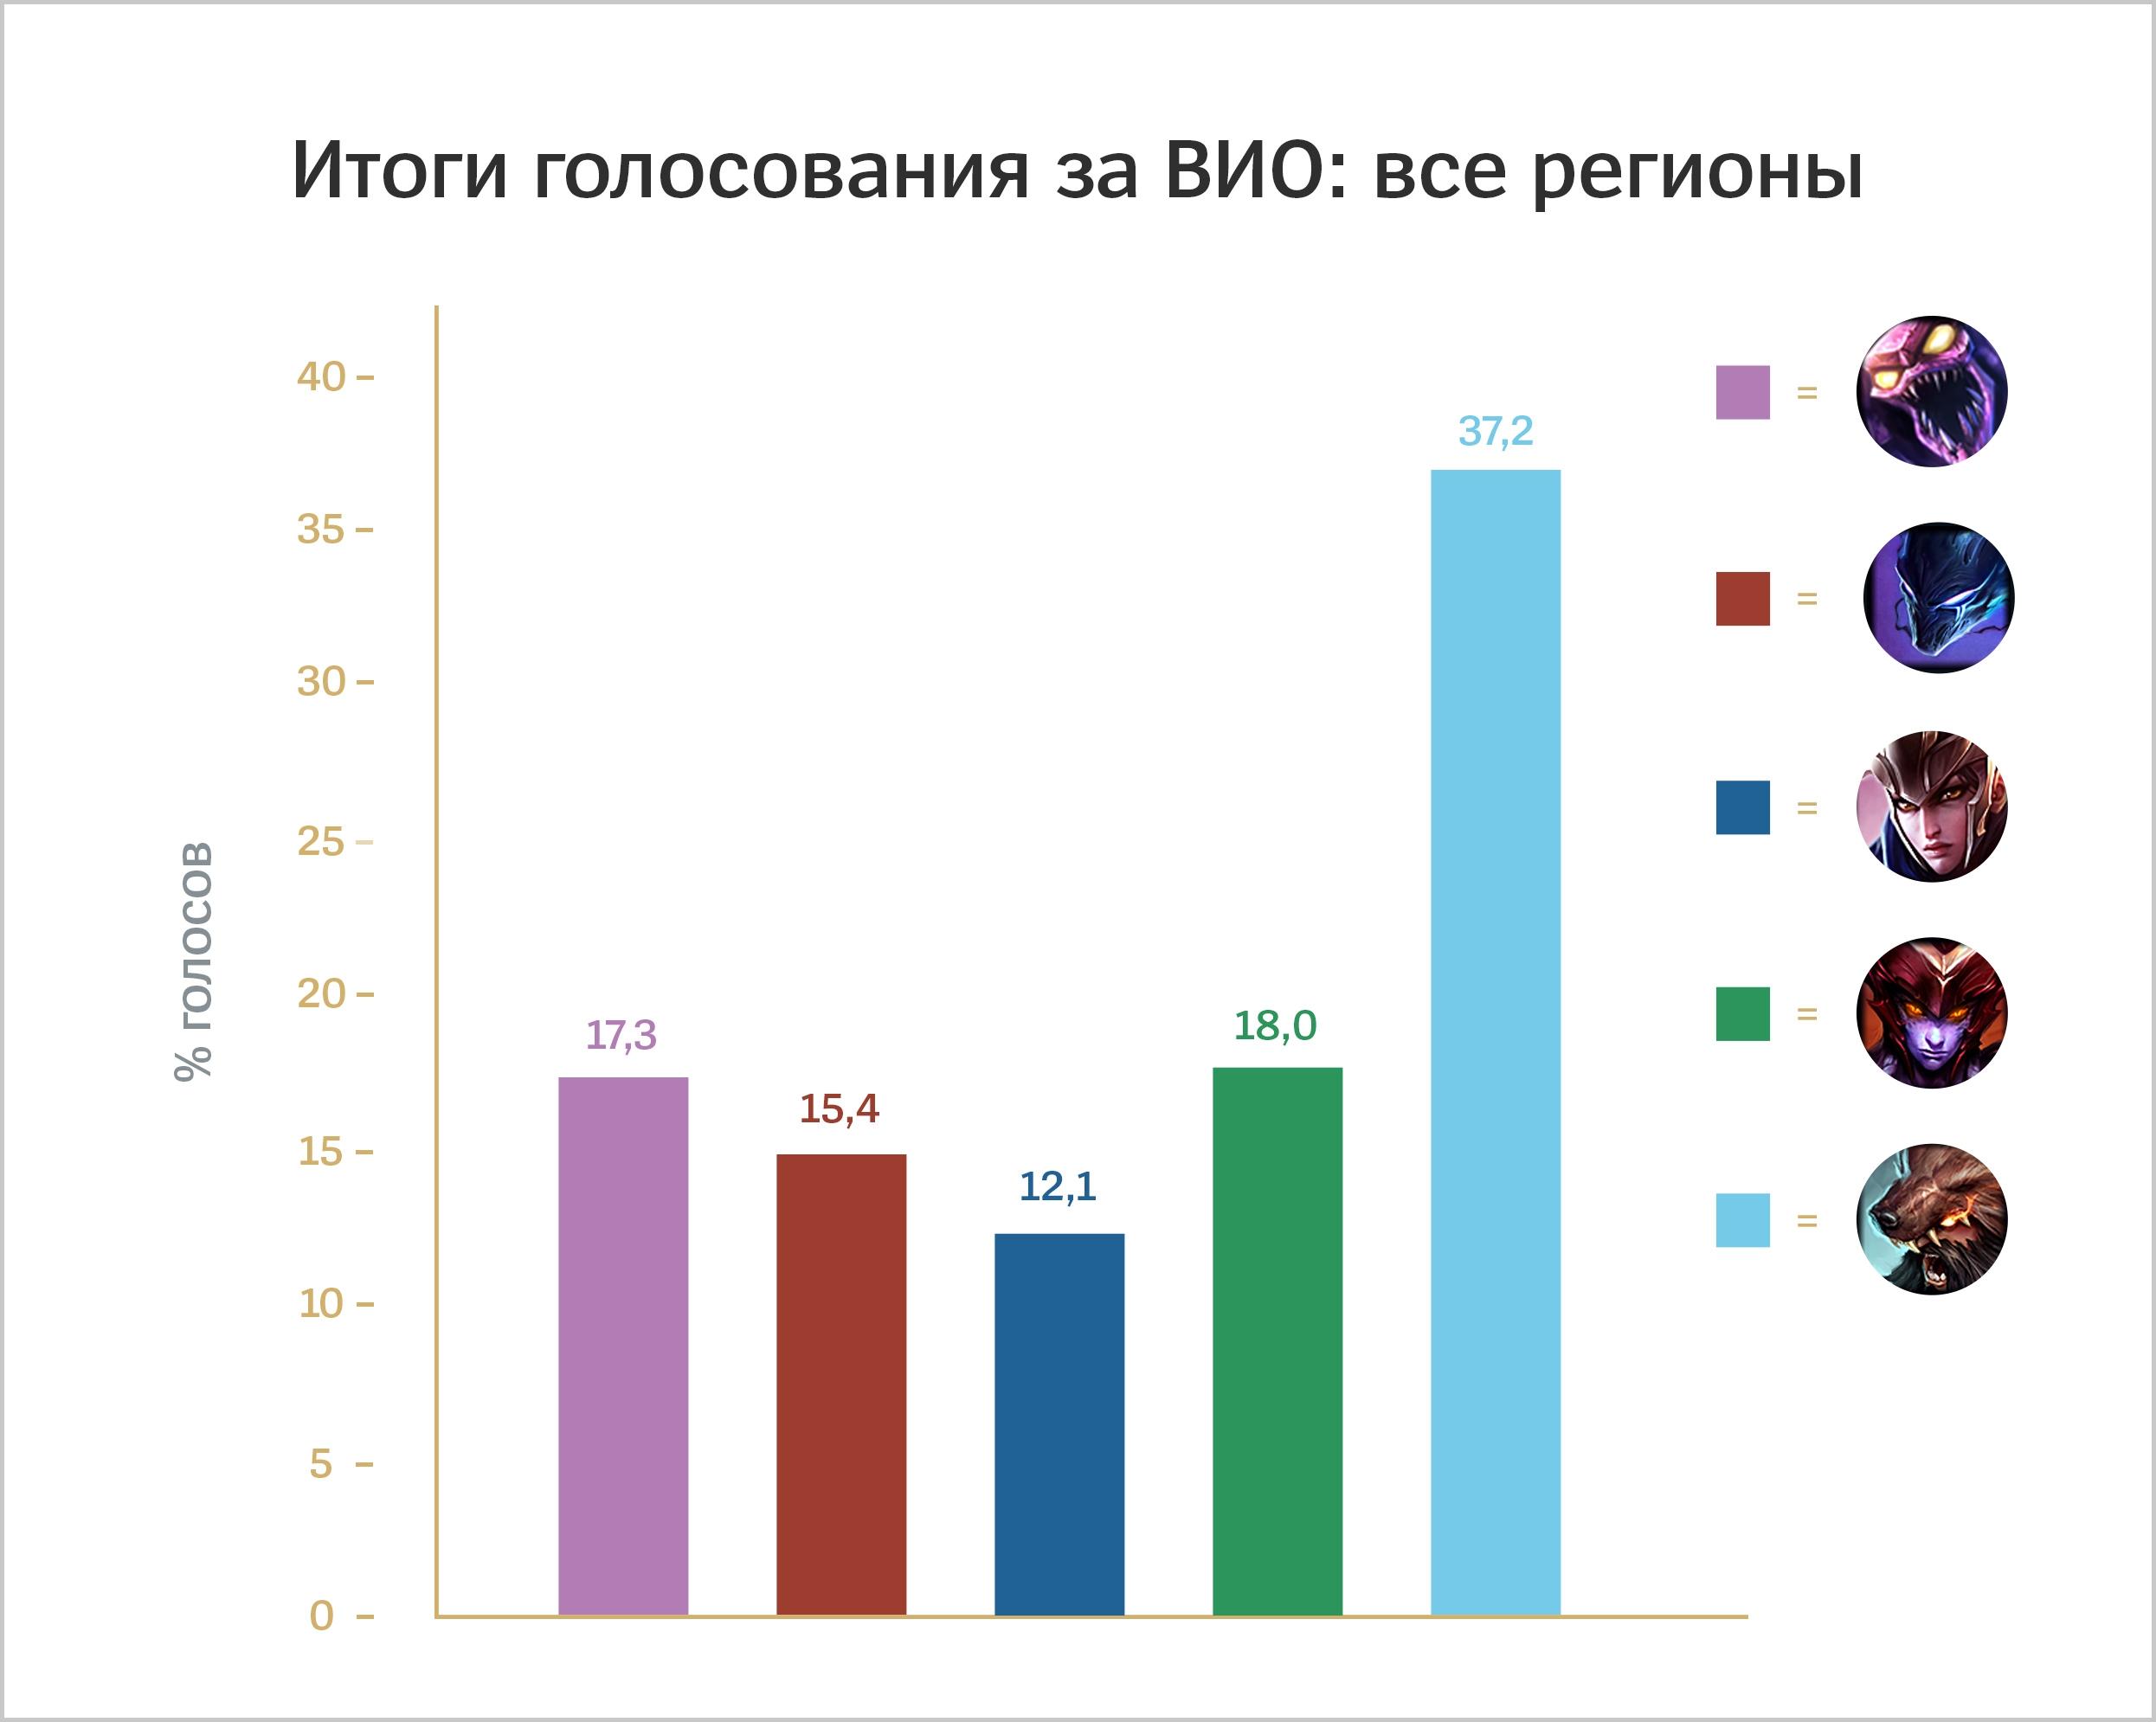 VGU_Voting_Results_RU.jpg